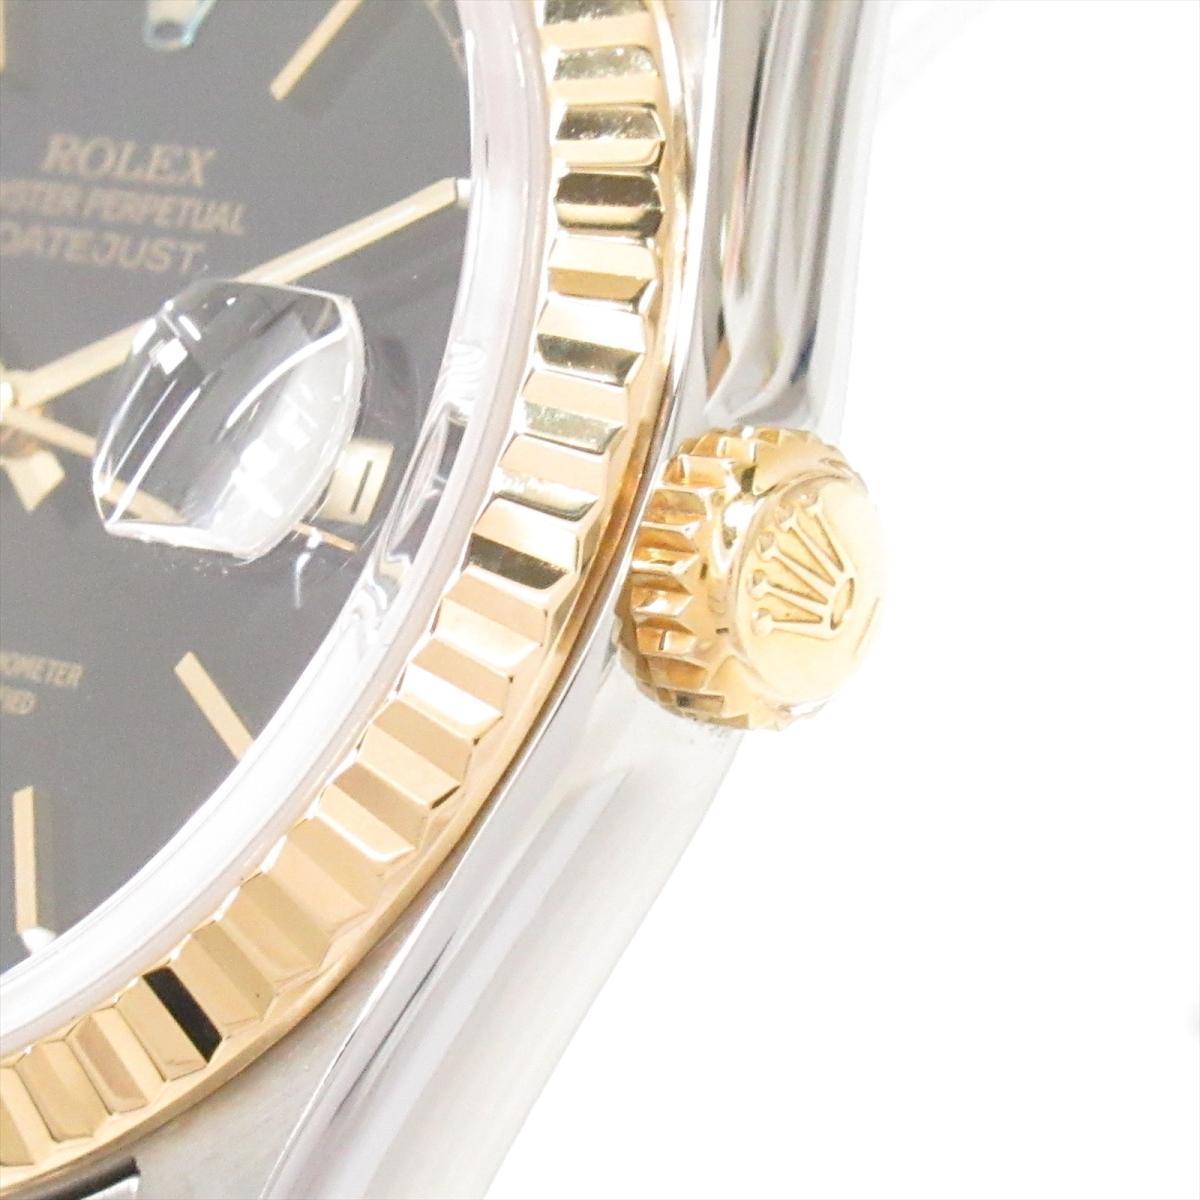 ROLEX 時計 16233 デイトジャスト 腕時計/メンズ